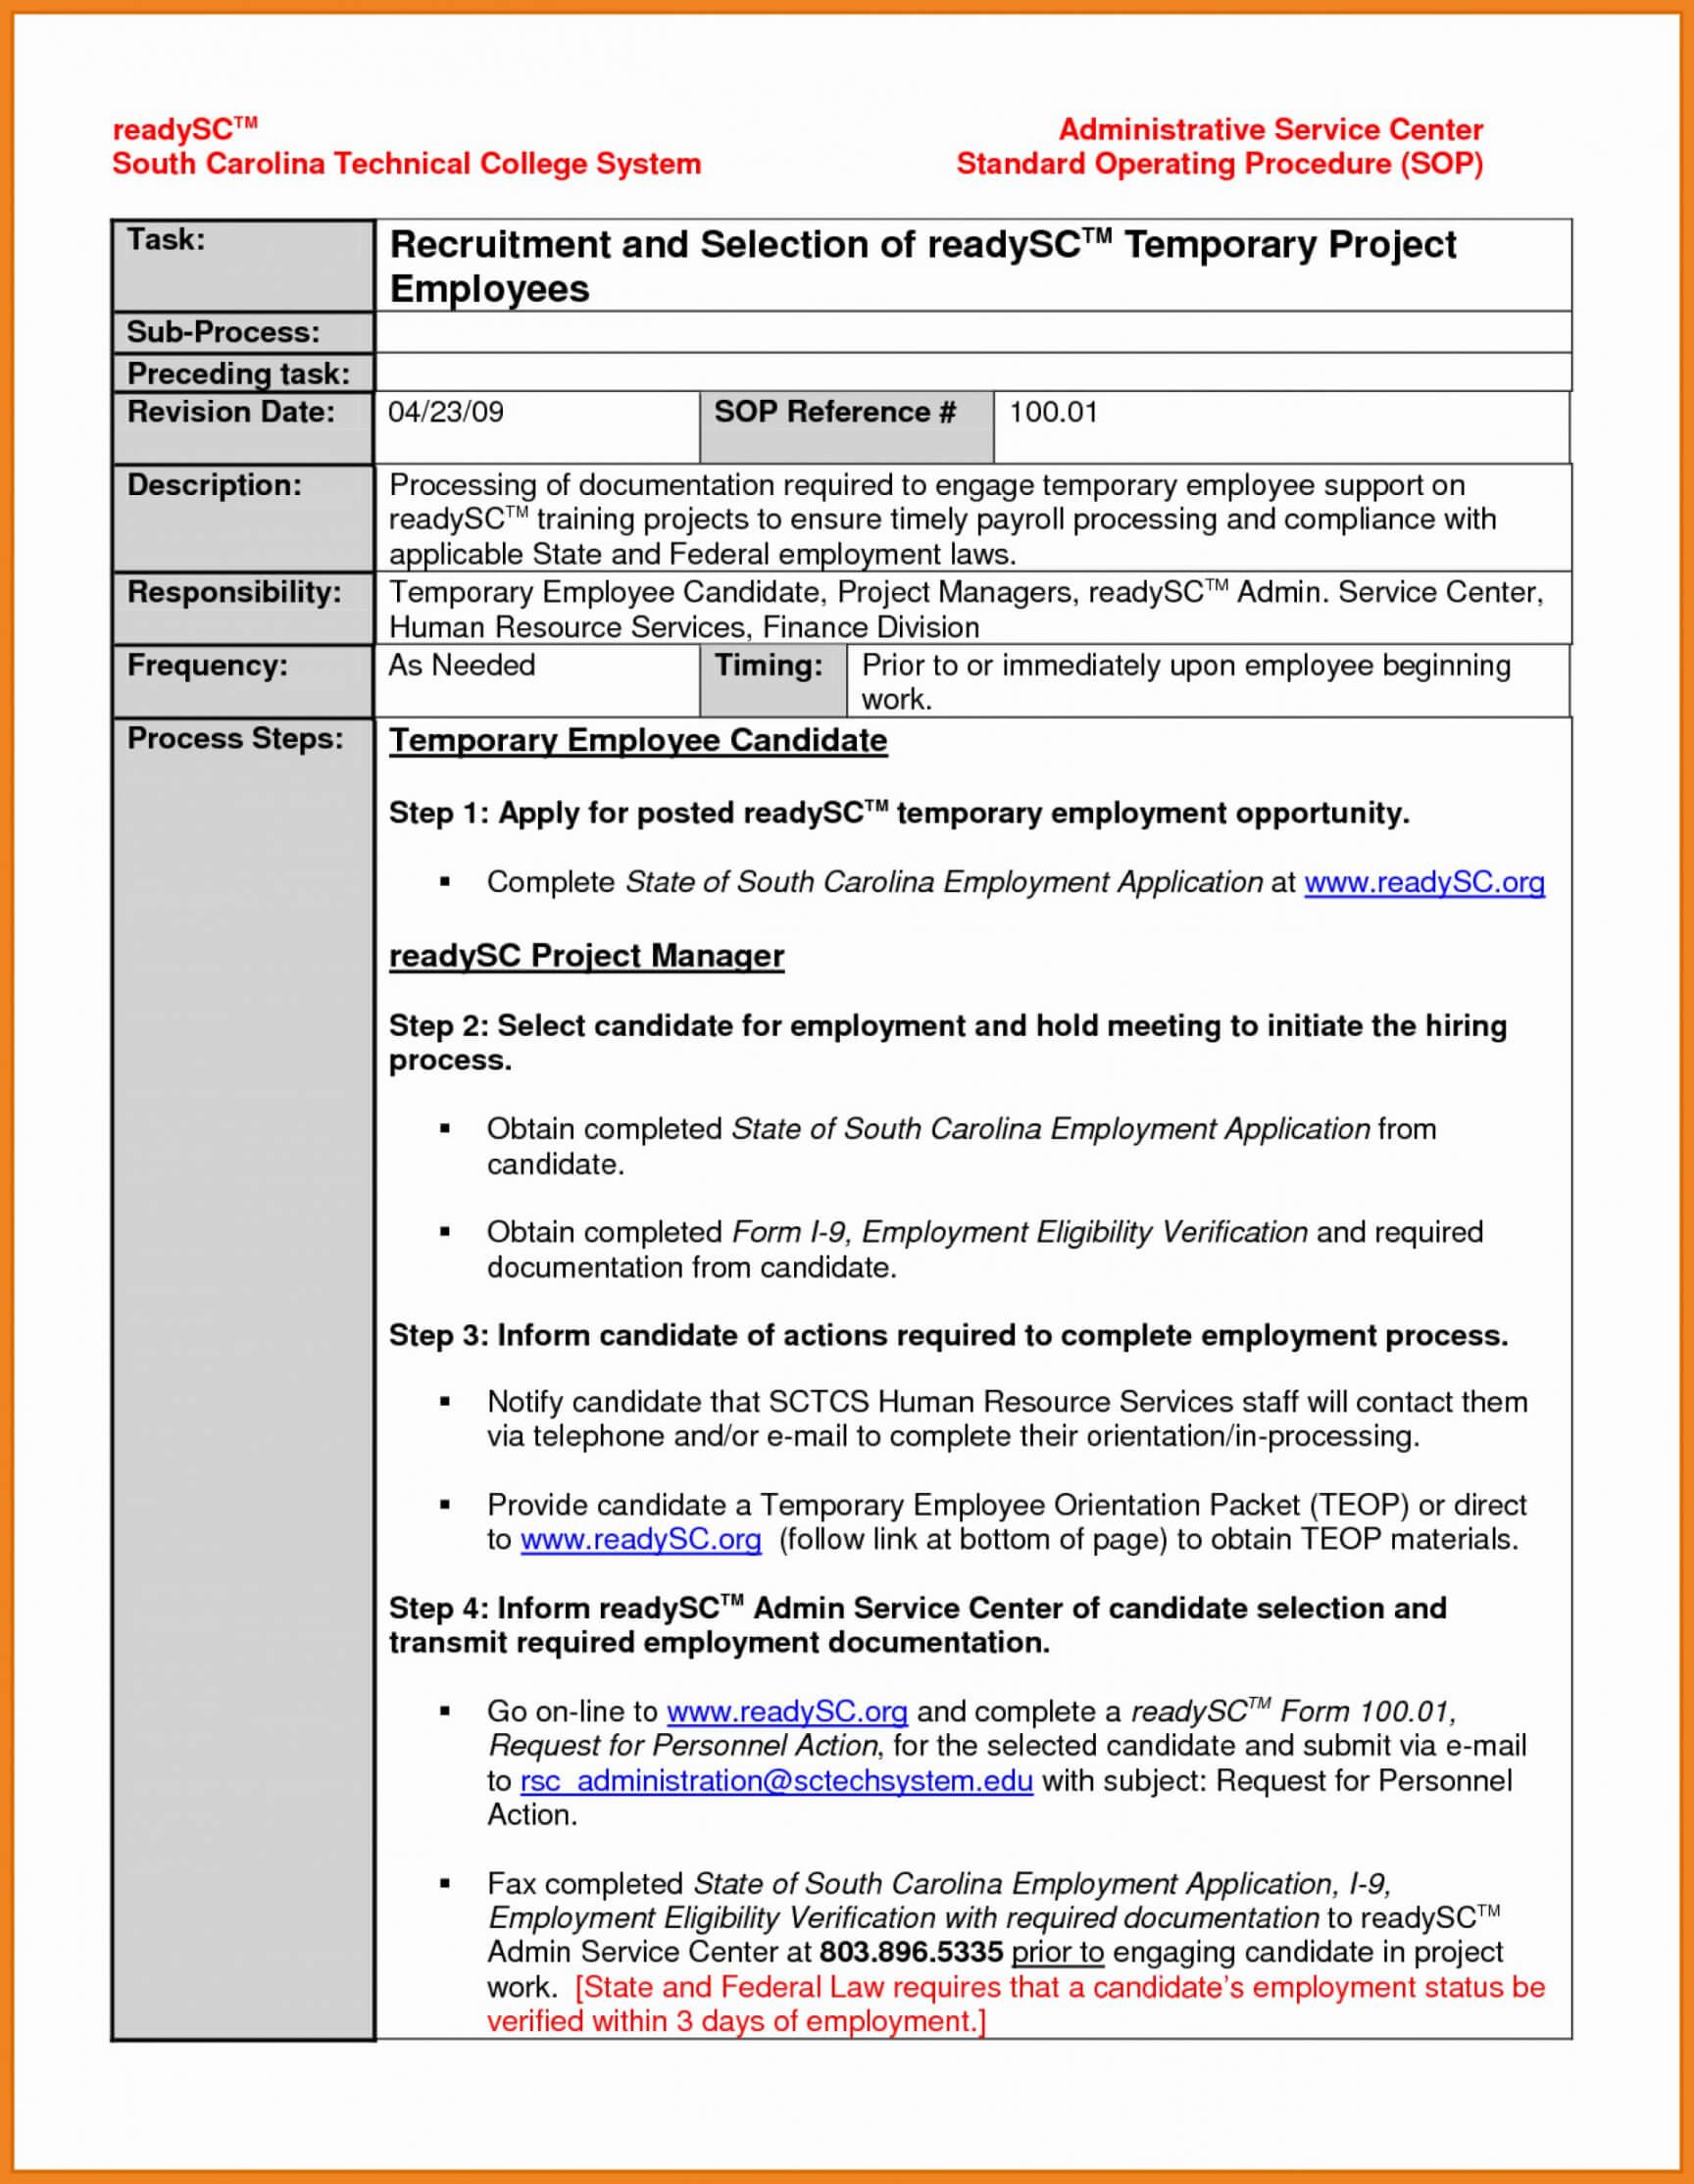 027 Standard Operating Procedure Template Word Free With Free Standard Operating Procedure Template Word 2010